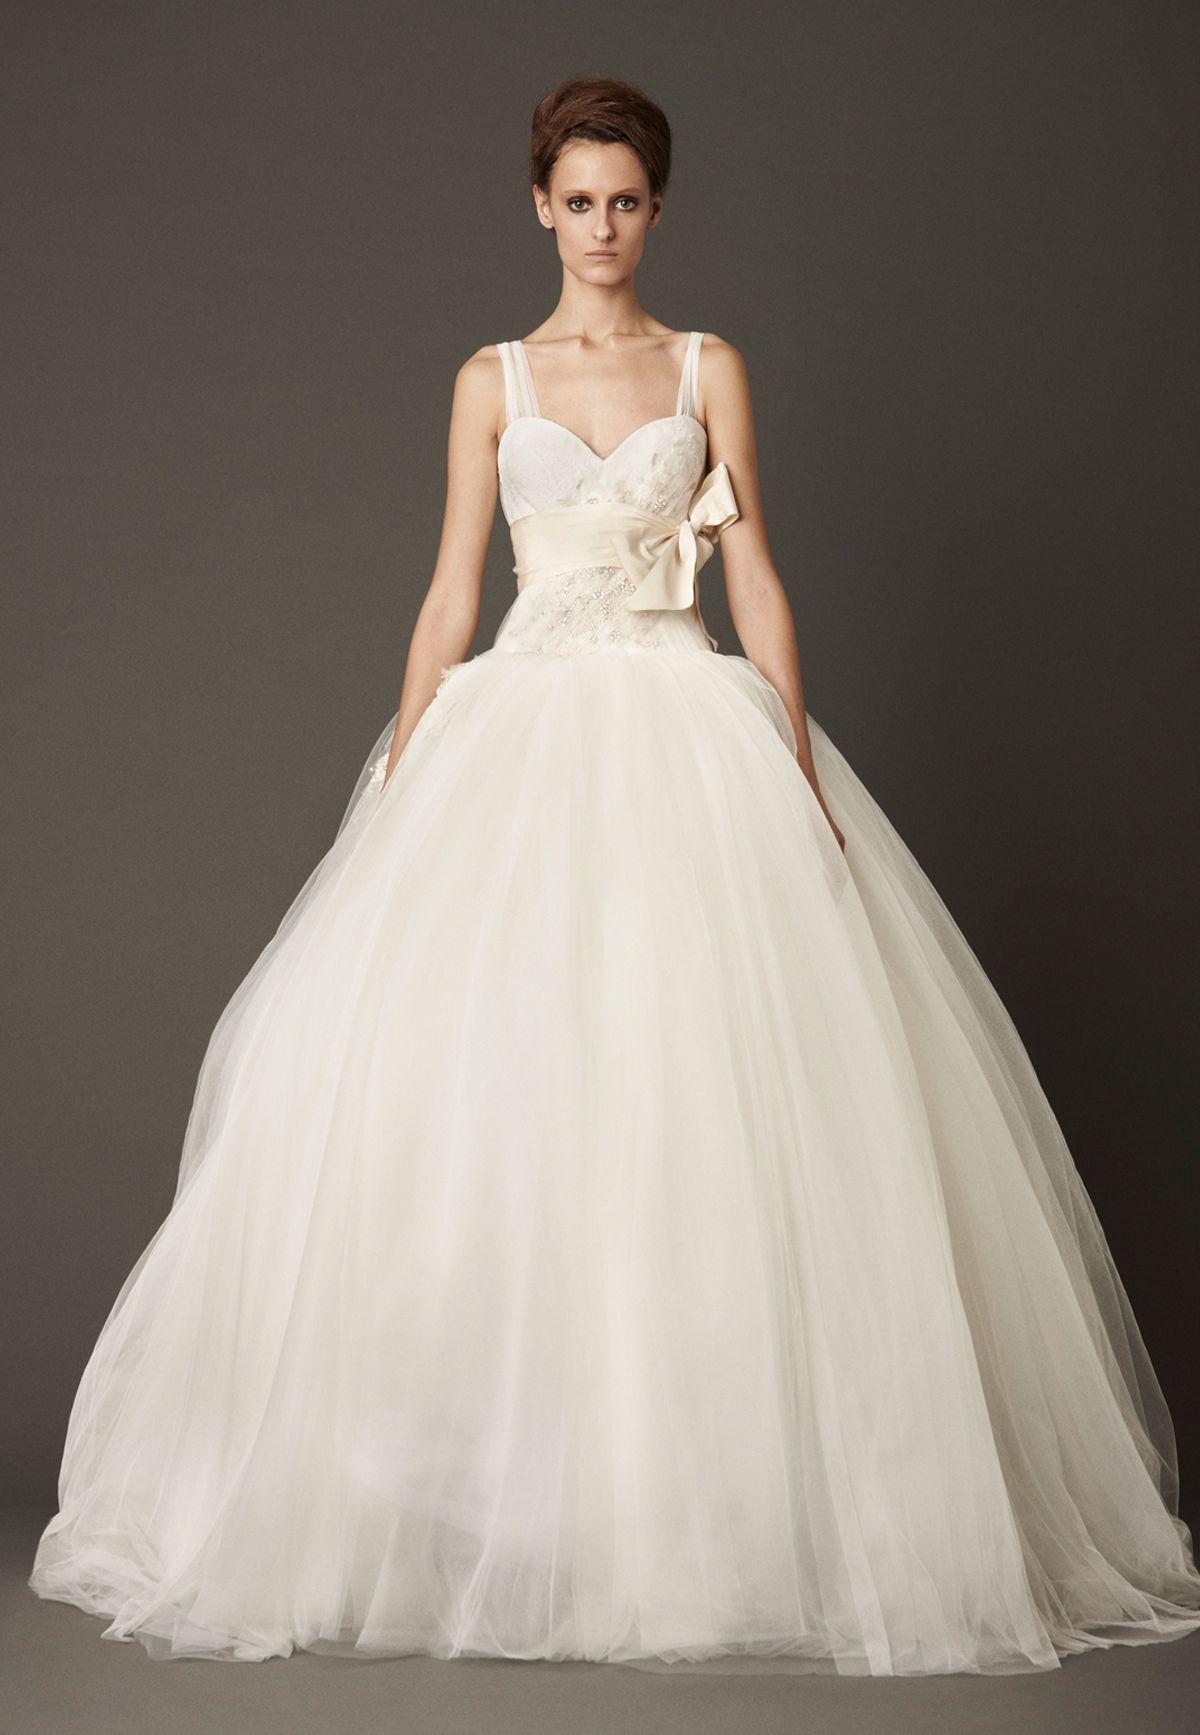 Dresses to wear at a wedding  Vera Wang  uLisaudress  Inspirational Dresses  Pinterest  Bridal